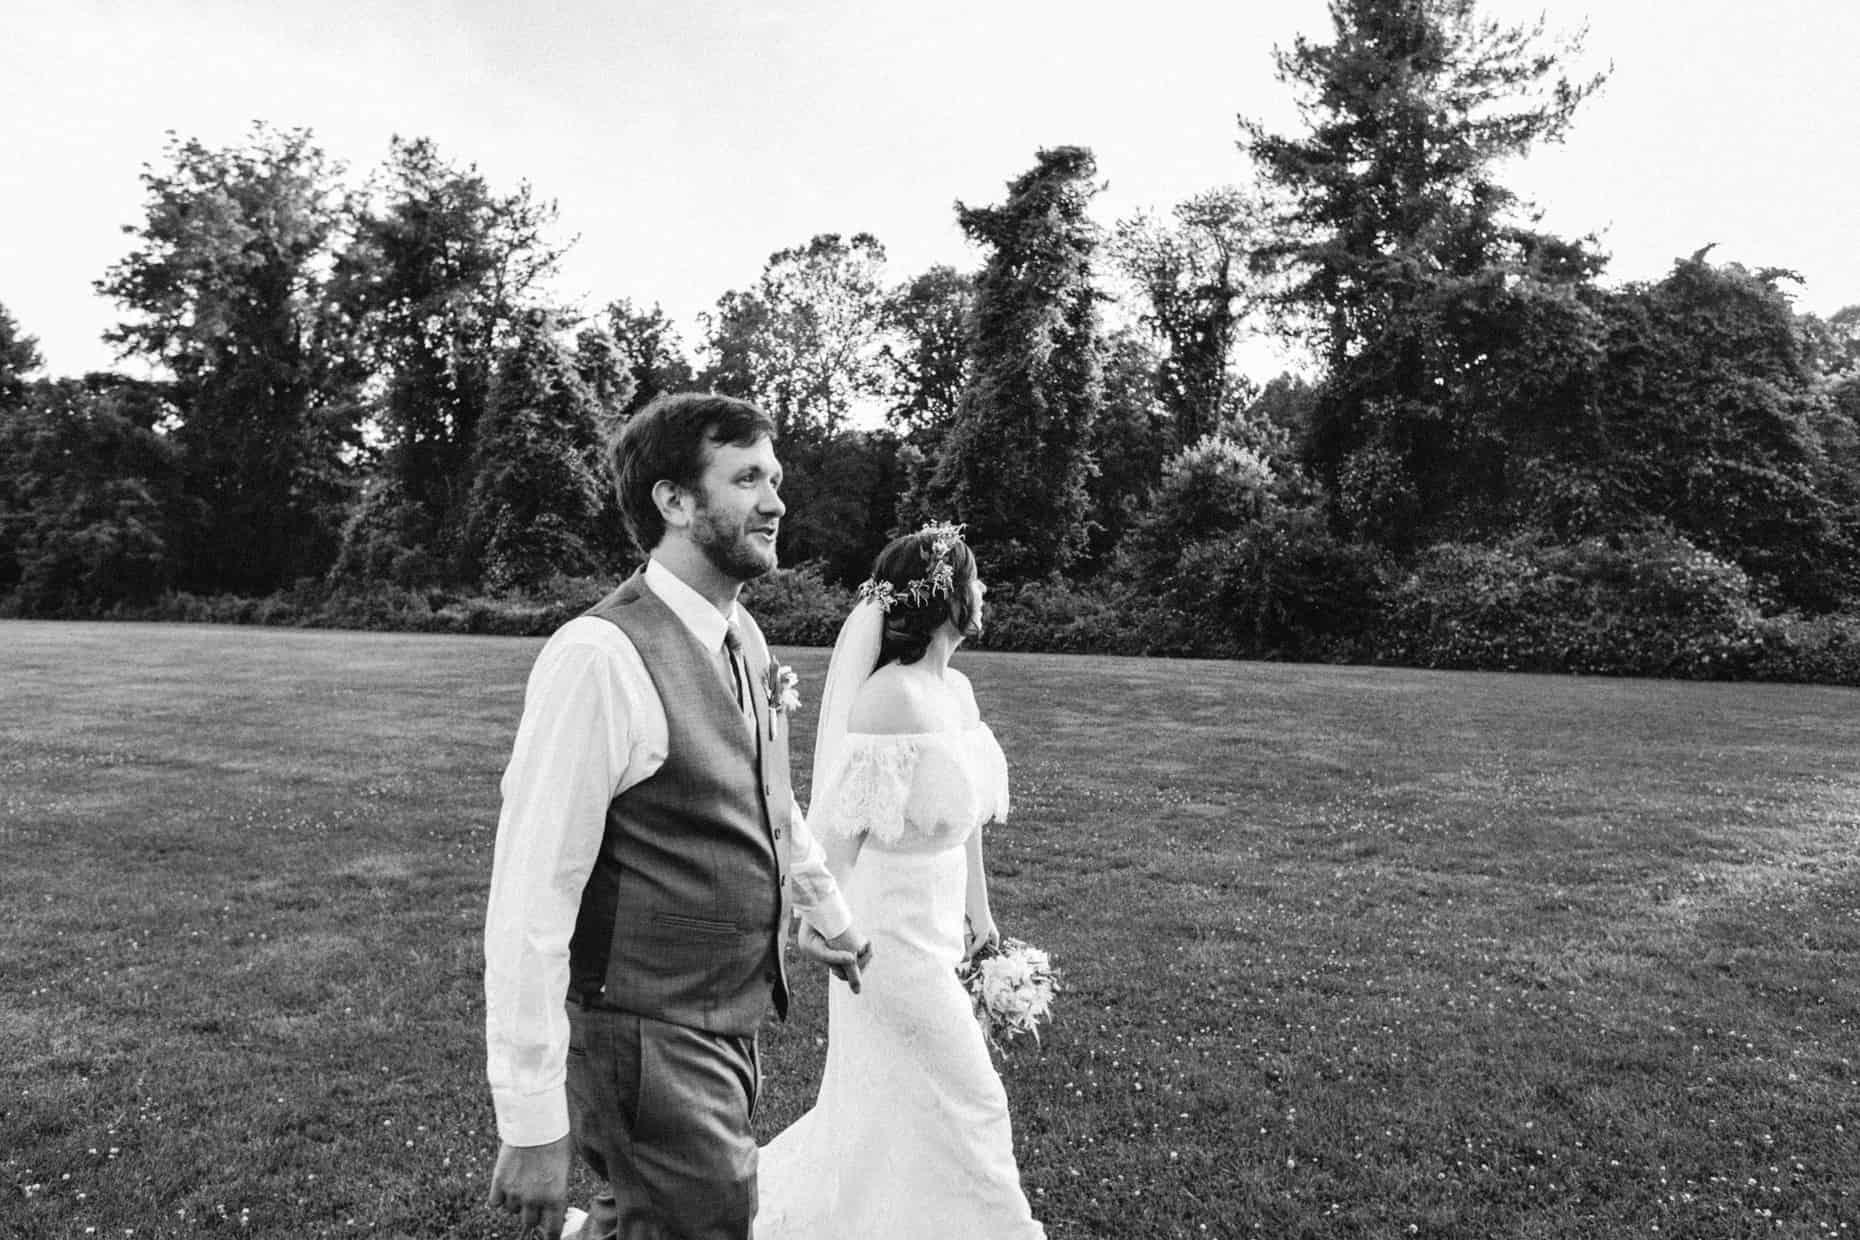 Phoenixville park wedding